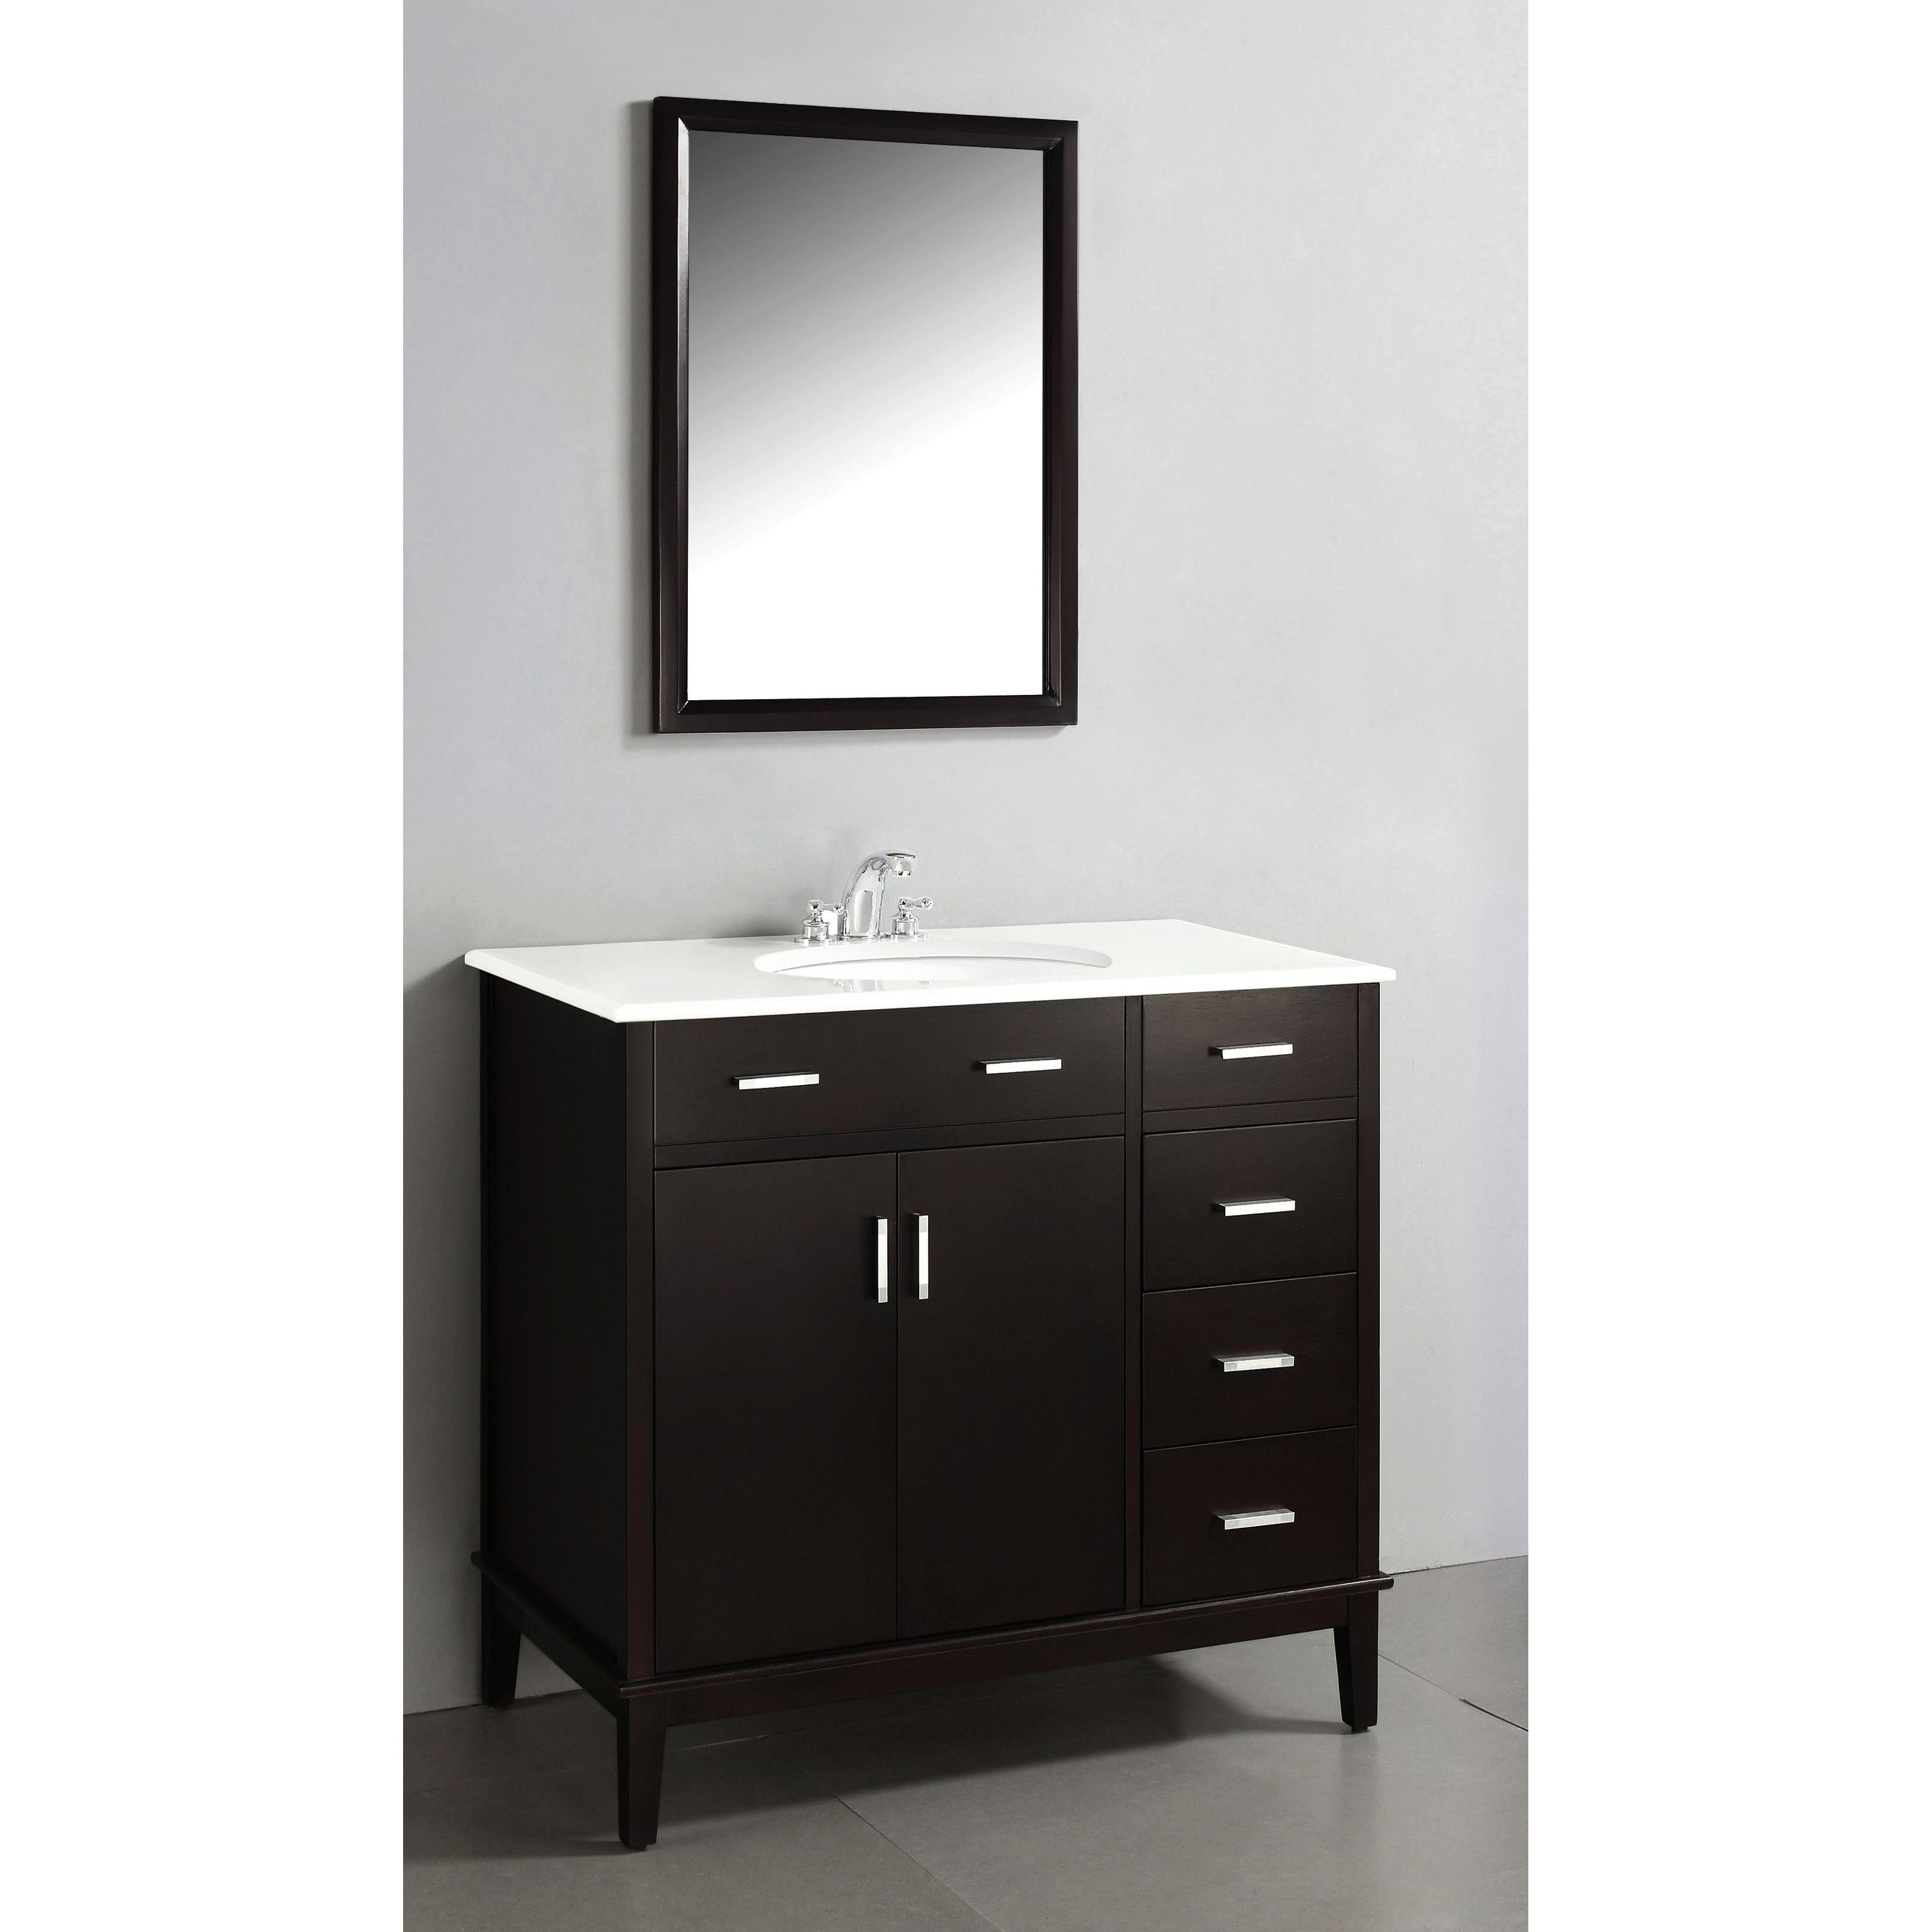 Luxury Photos Of 36 Inch Bathroom Vanity With Top - Bathroom